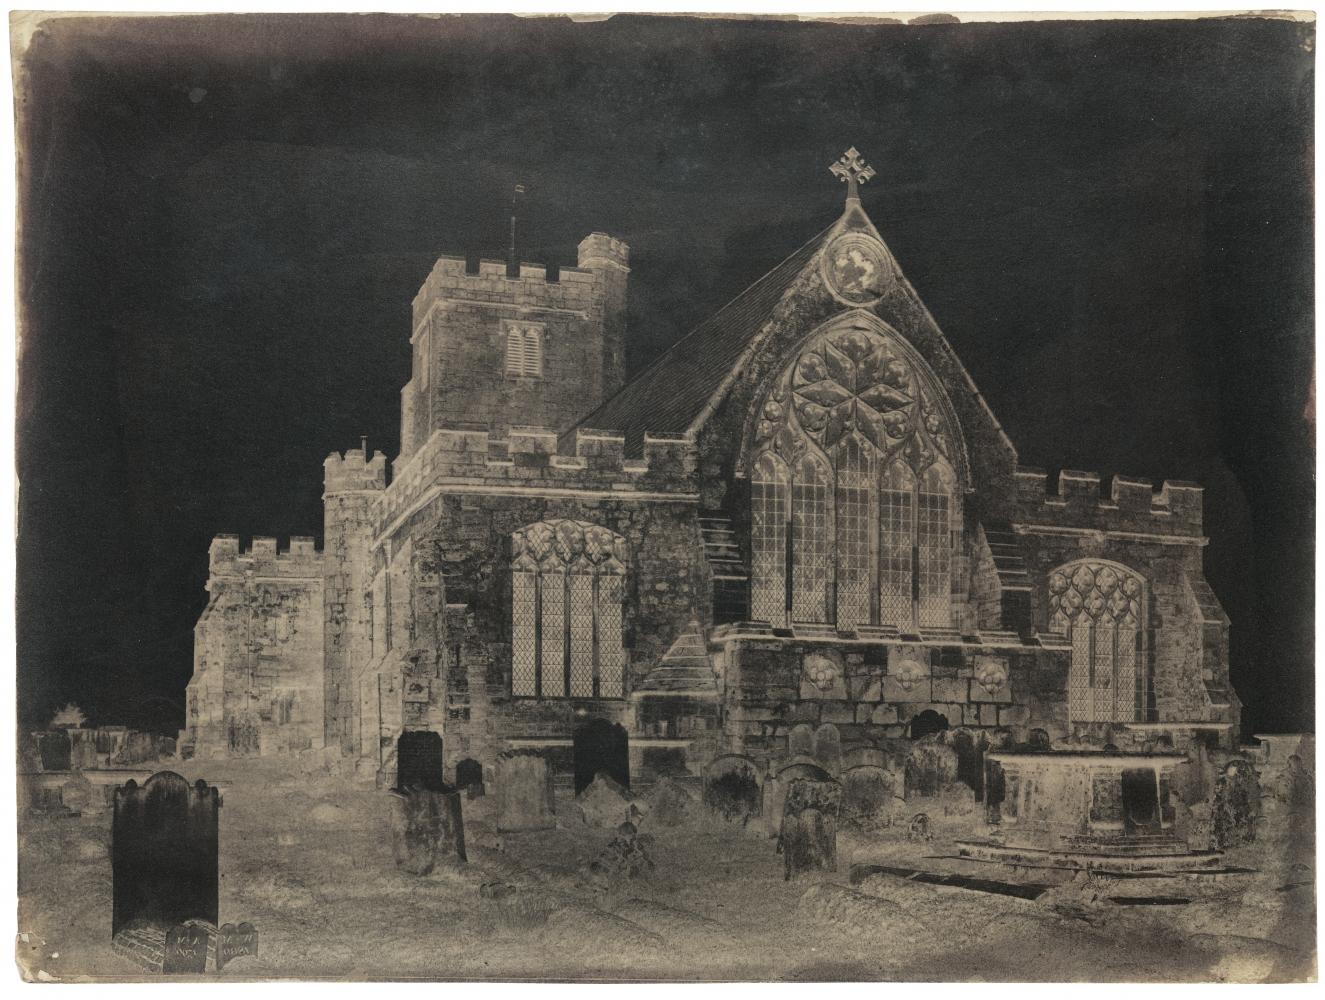 Benjamin Brecknell TURNER (English, 1815-1894) East end, Hawkhurst Church, Kent, 1852-1854 Waxed calotype negative 29.9 x 39.8 cm